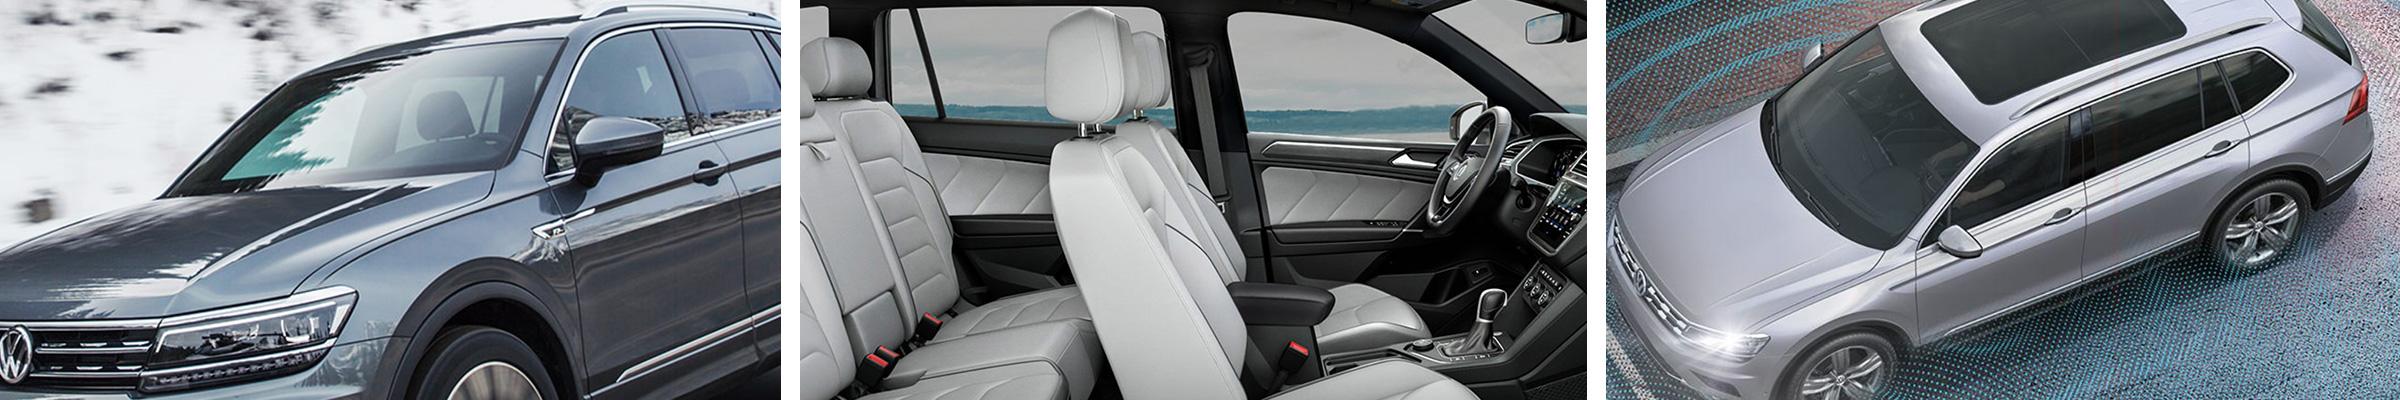 2021 Volkswagen Tiguan For Sale West Palm Beach FL | Wellington